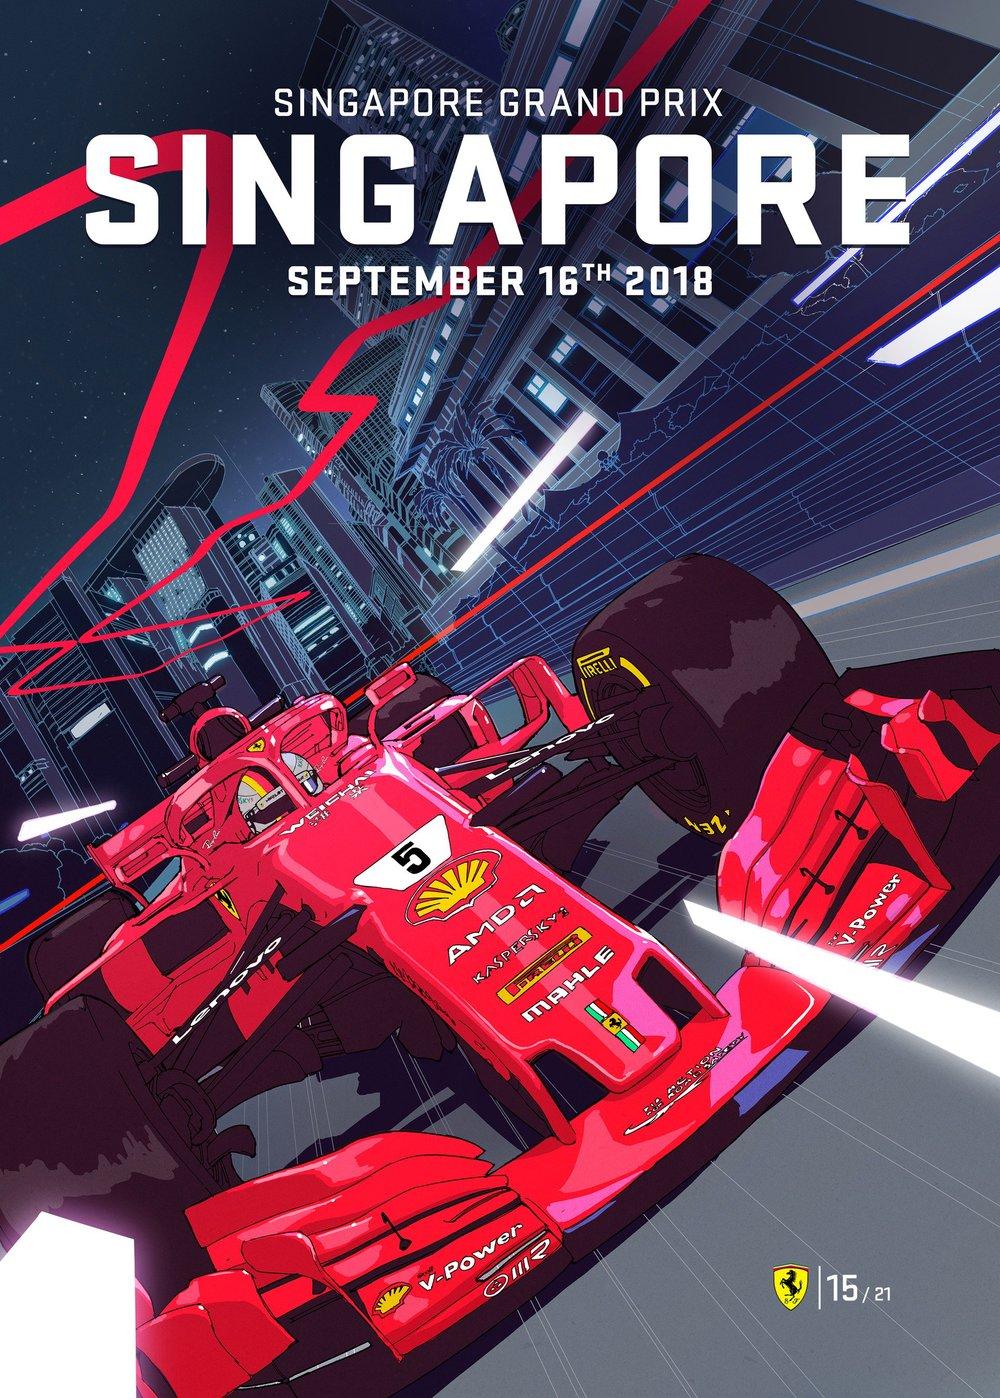 2018 Singapore Grand Prix